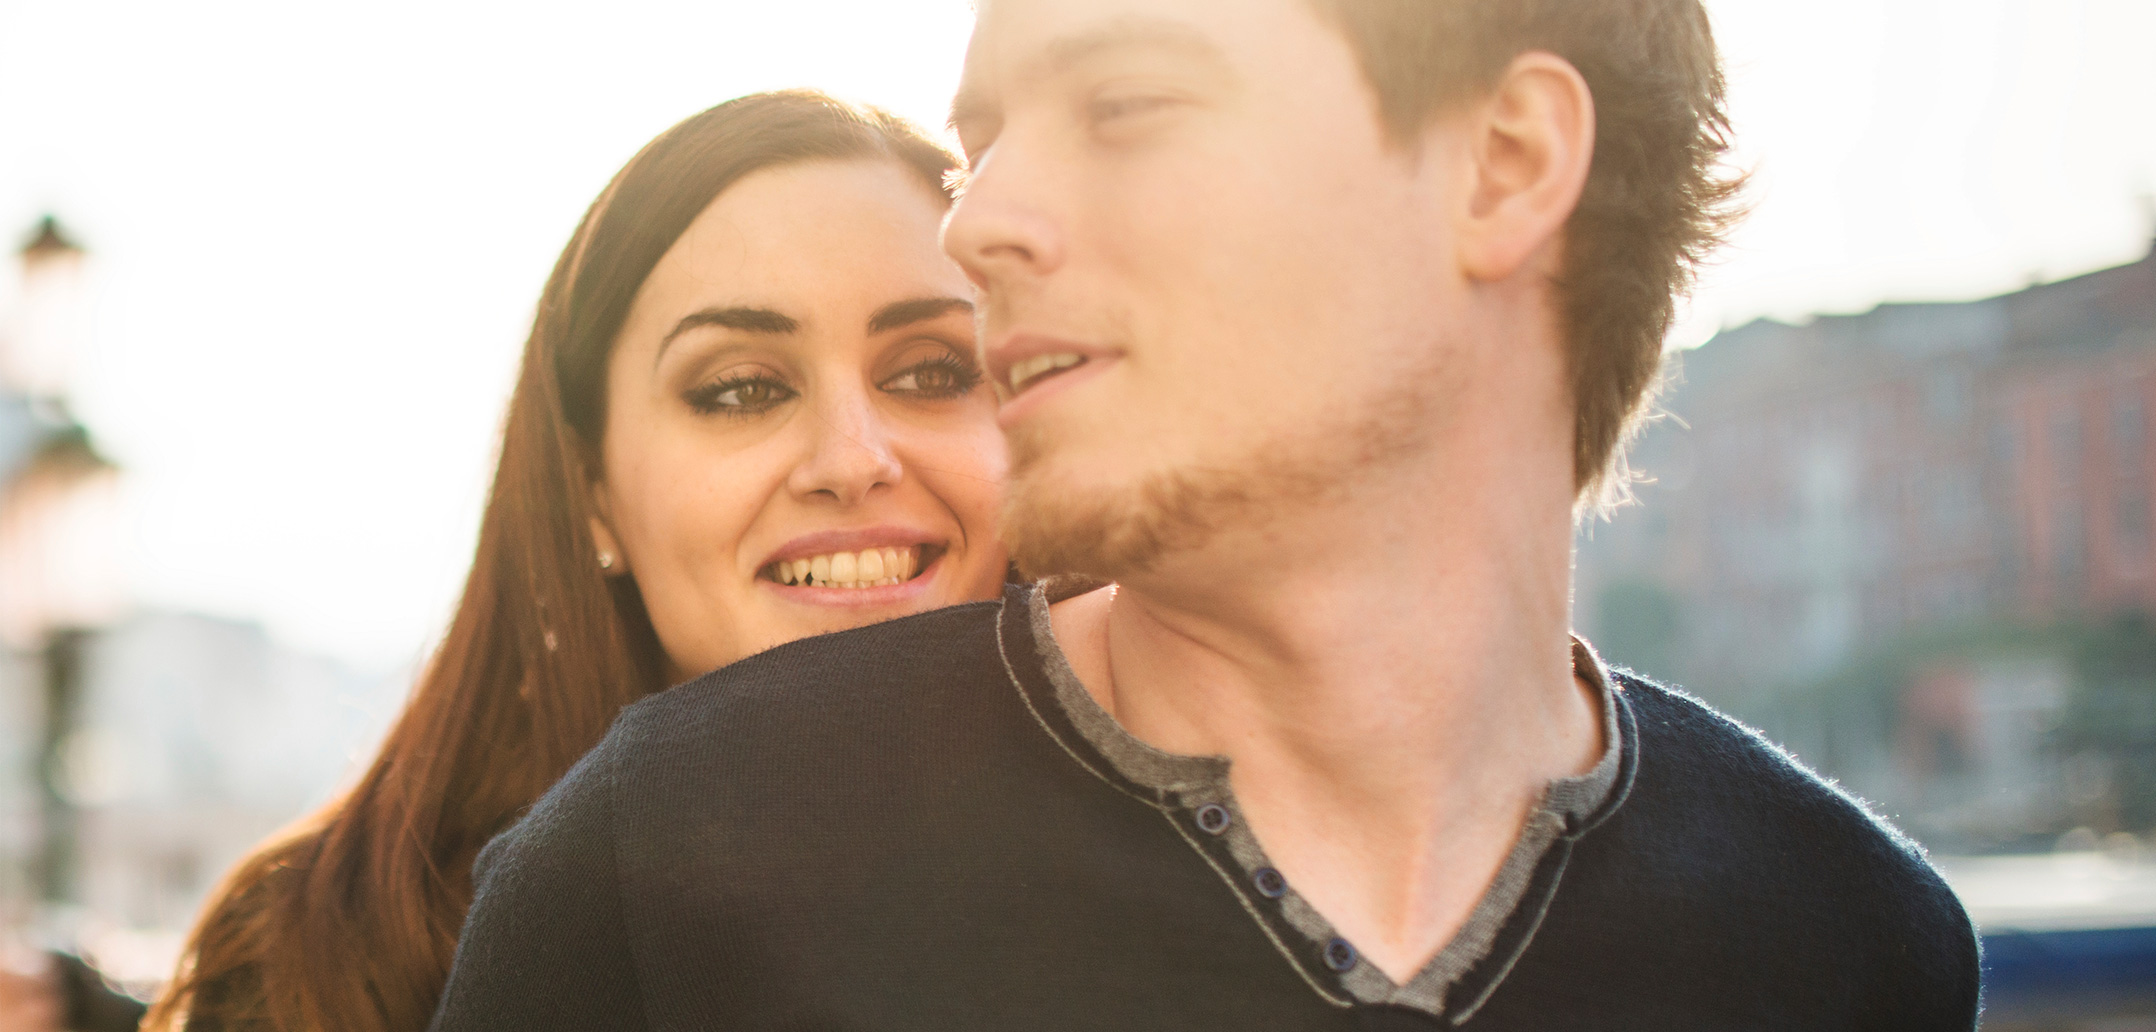 Neu In Den Partner Verlieben Beziehungsweise